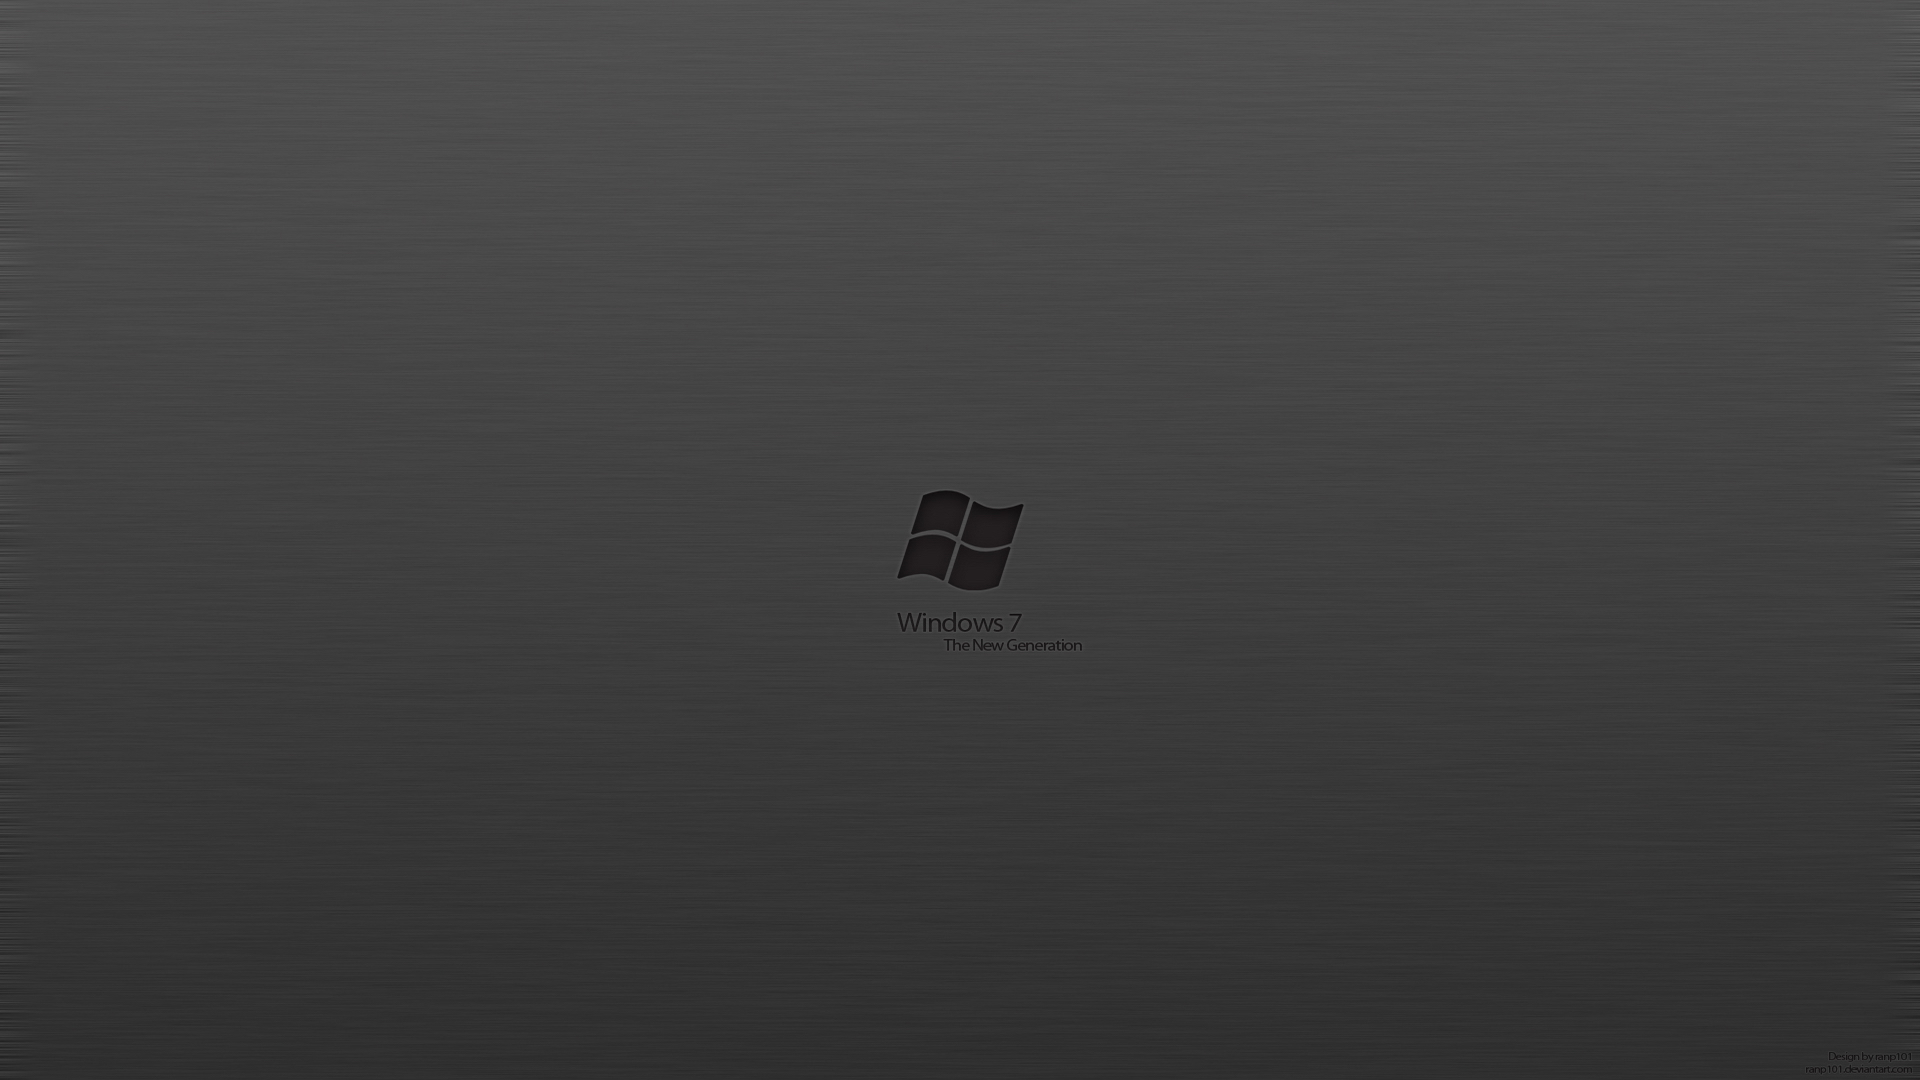 1920x1200+(Windows)_resize.jpg